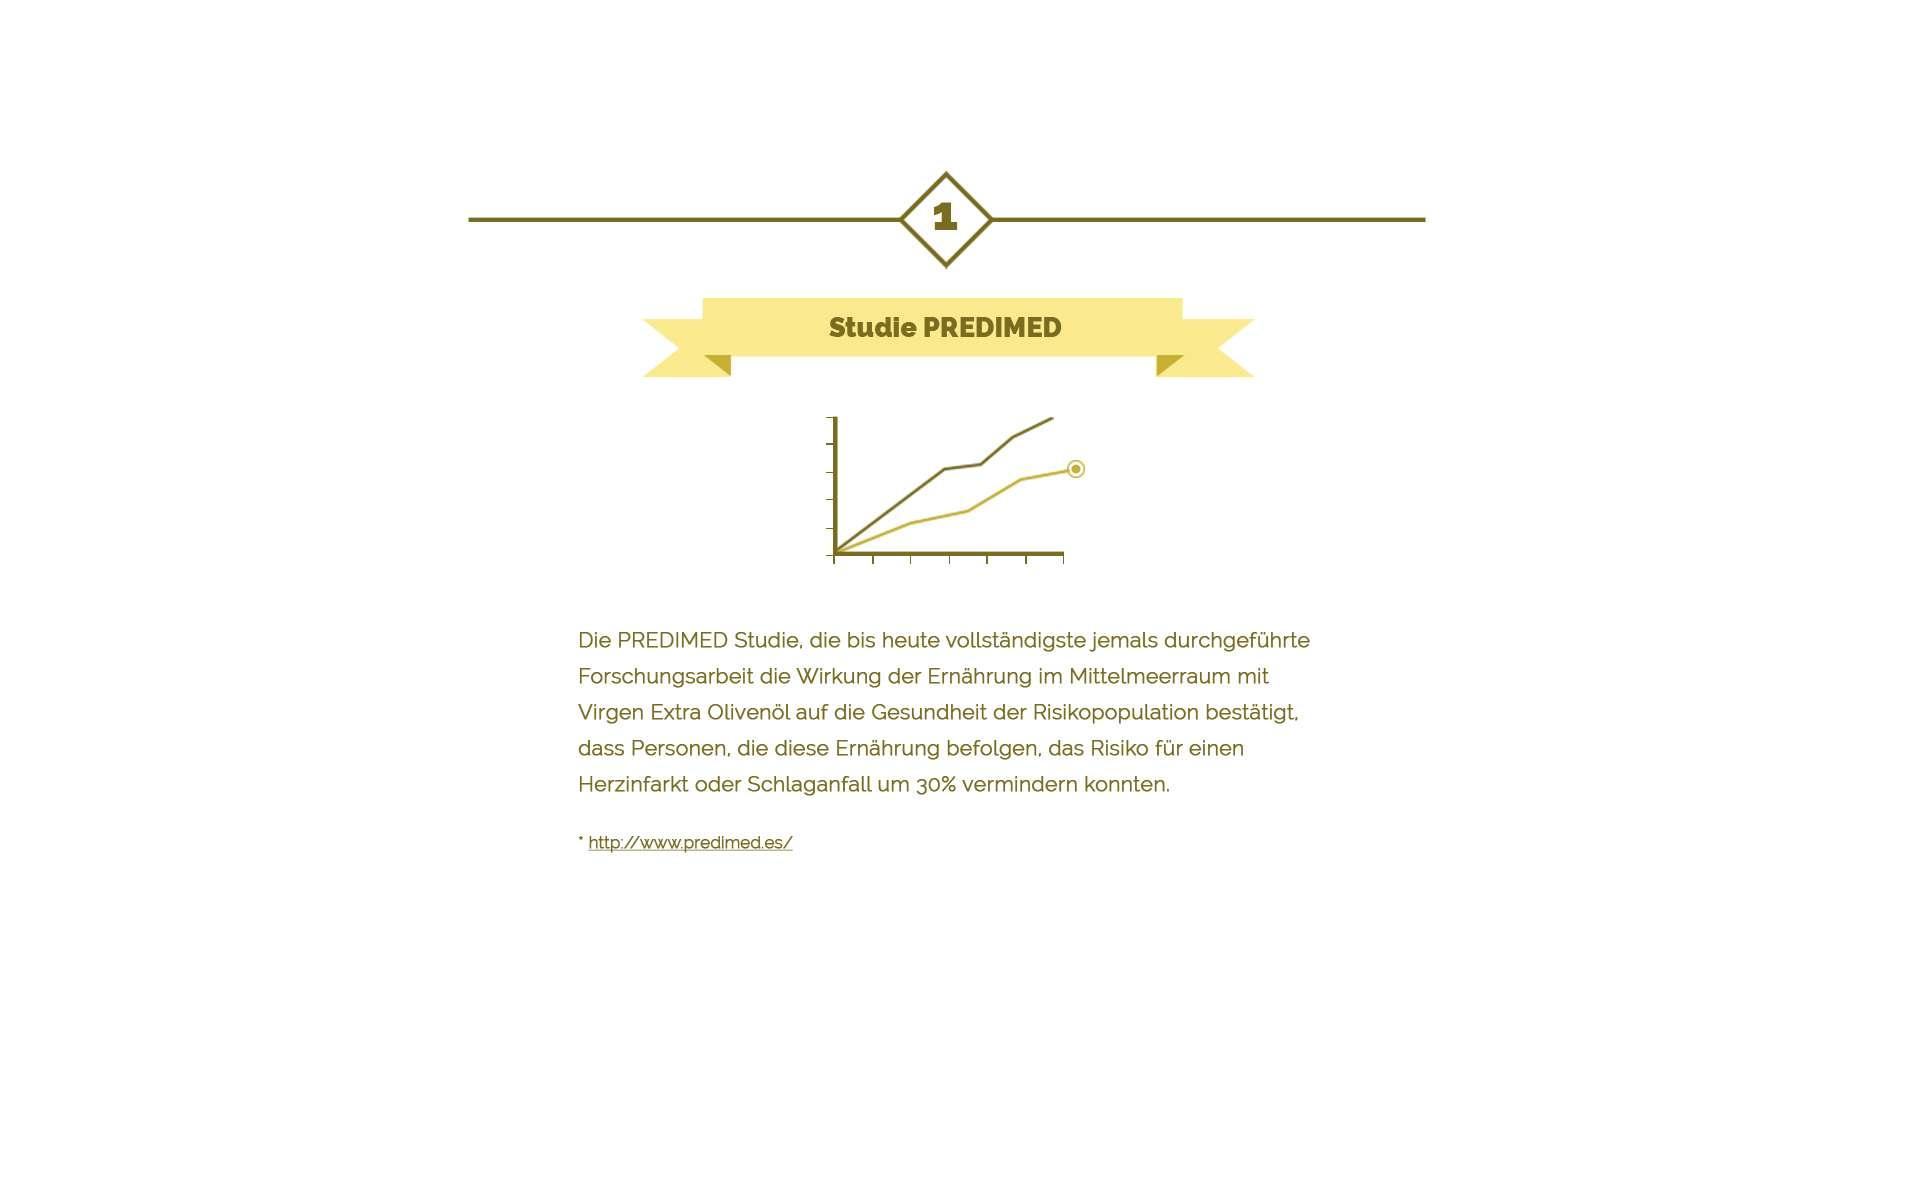 Predimed Studium über Olivenöl